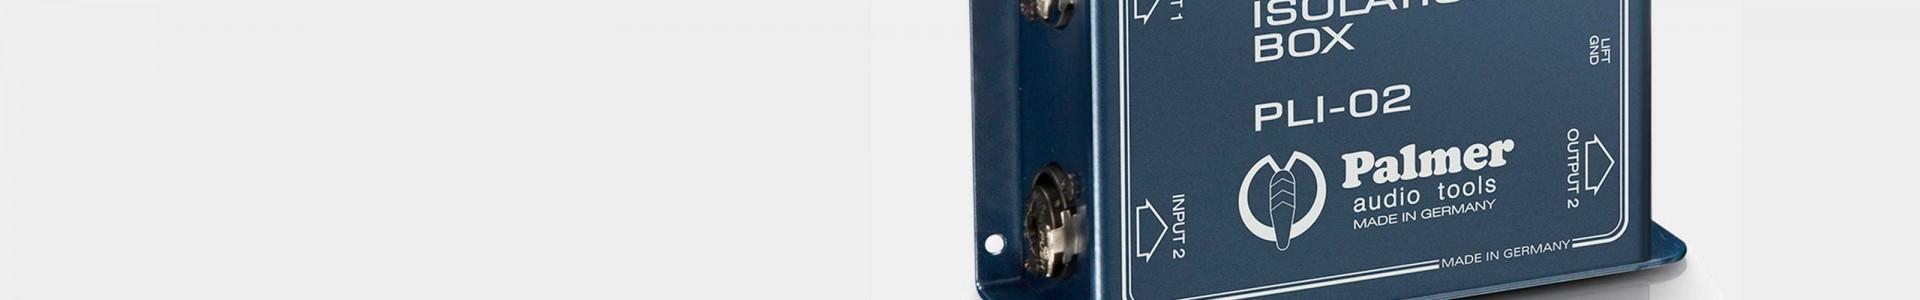 Palmer at Avacab - Professional sound equipment online